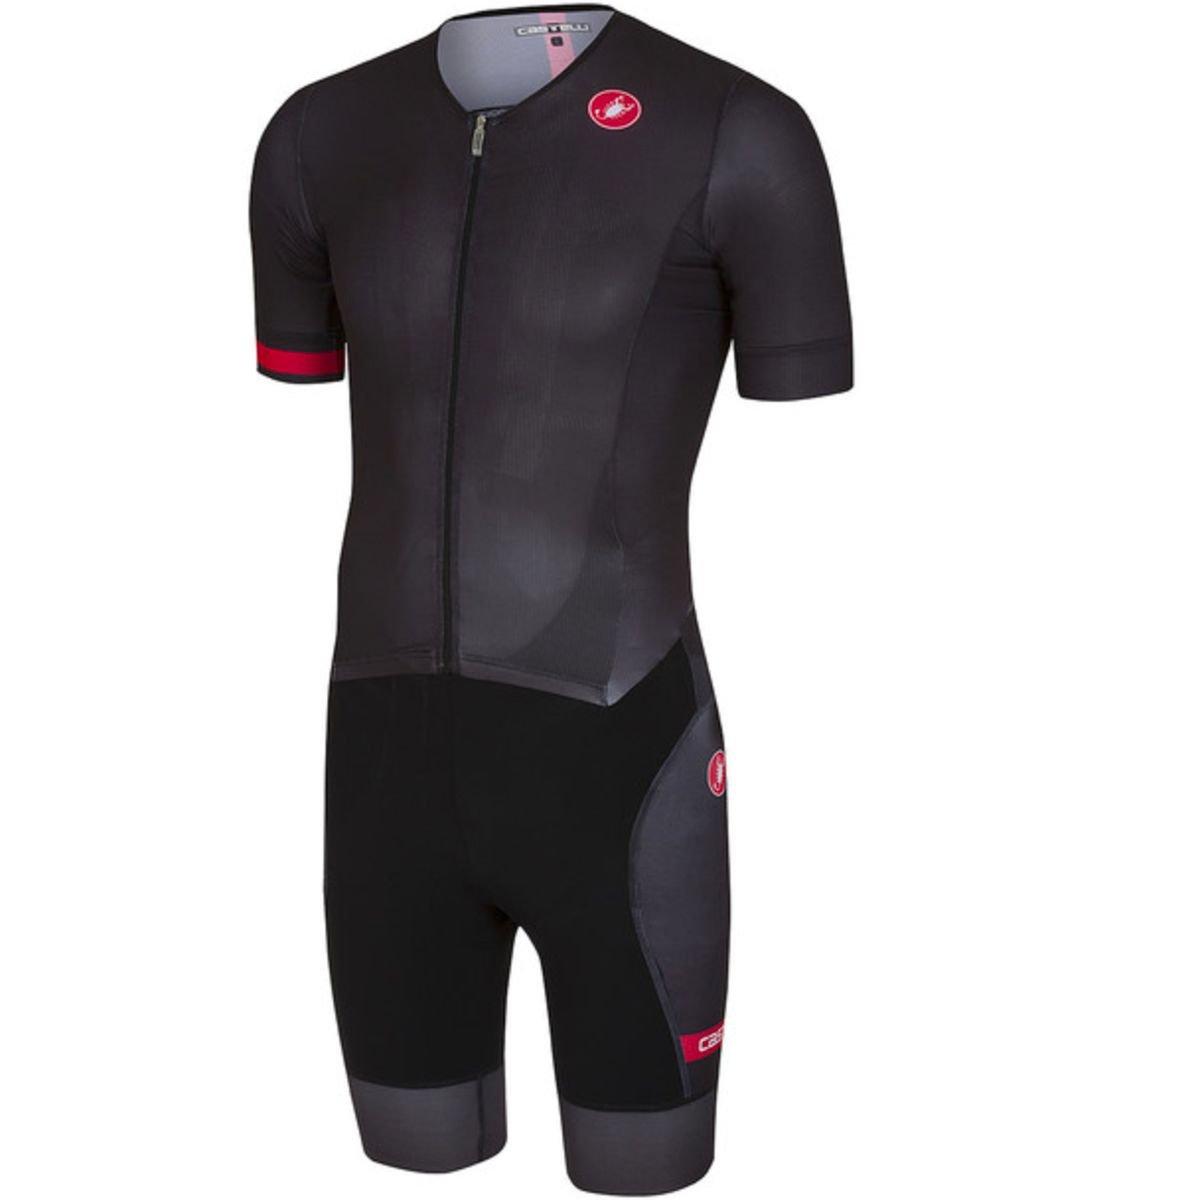 Castelli Free Sanremo Short-Sleeve Suit - Men's Black, S